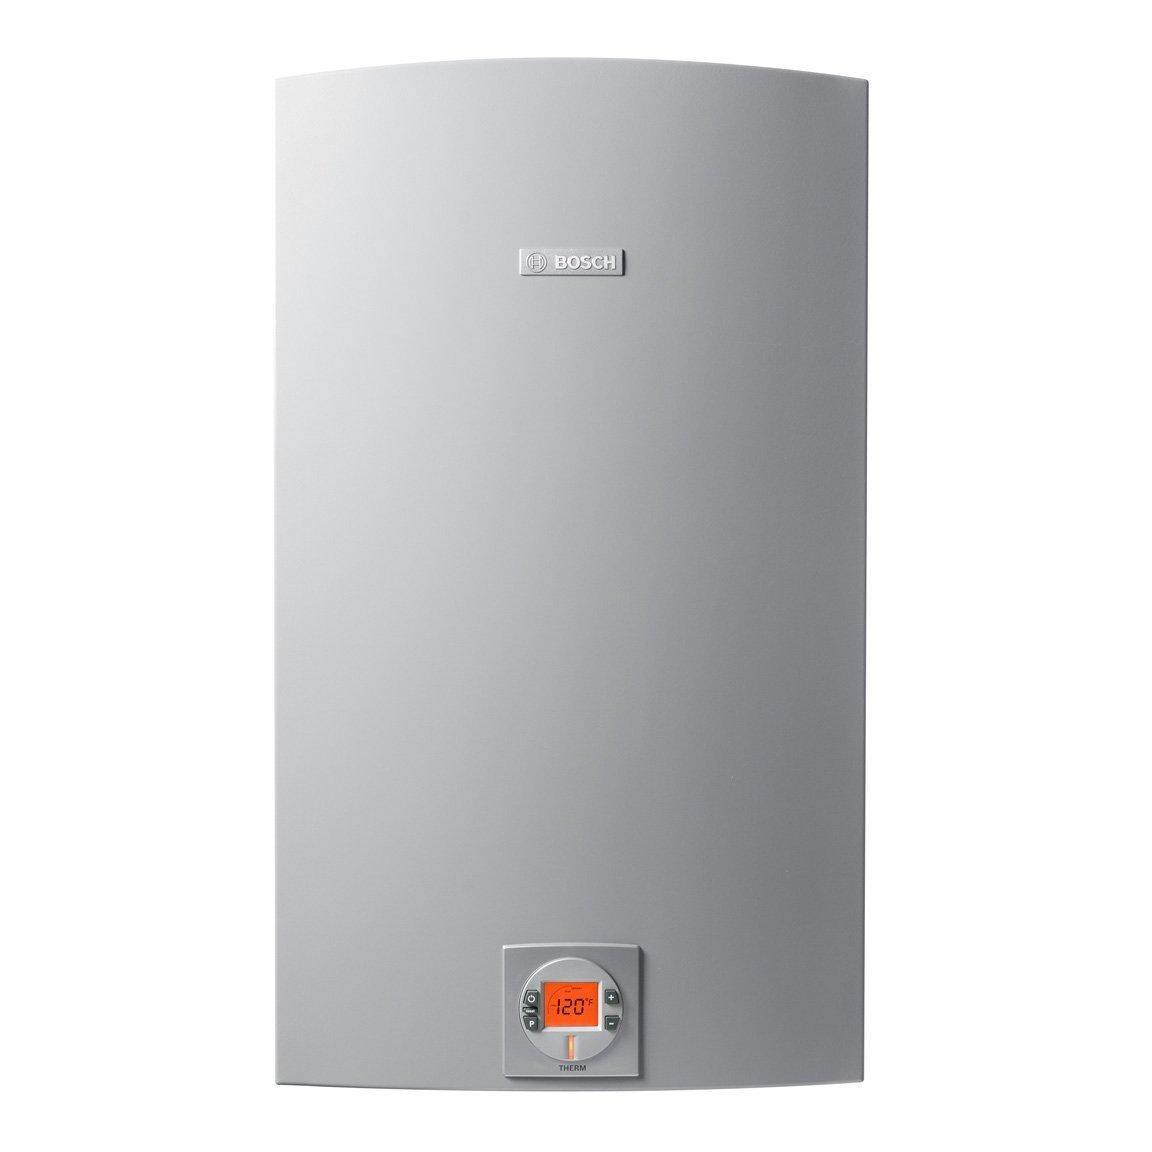 Bosch Tankless Water Heater Reviews 7 Best Selling